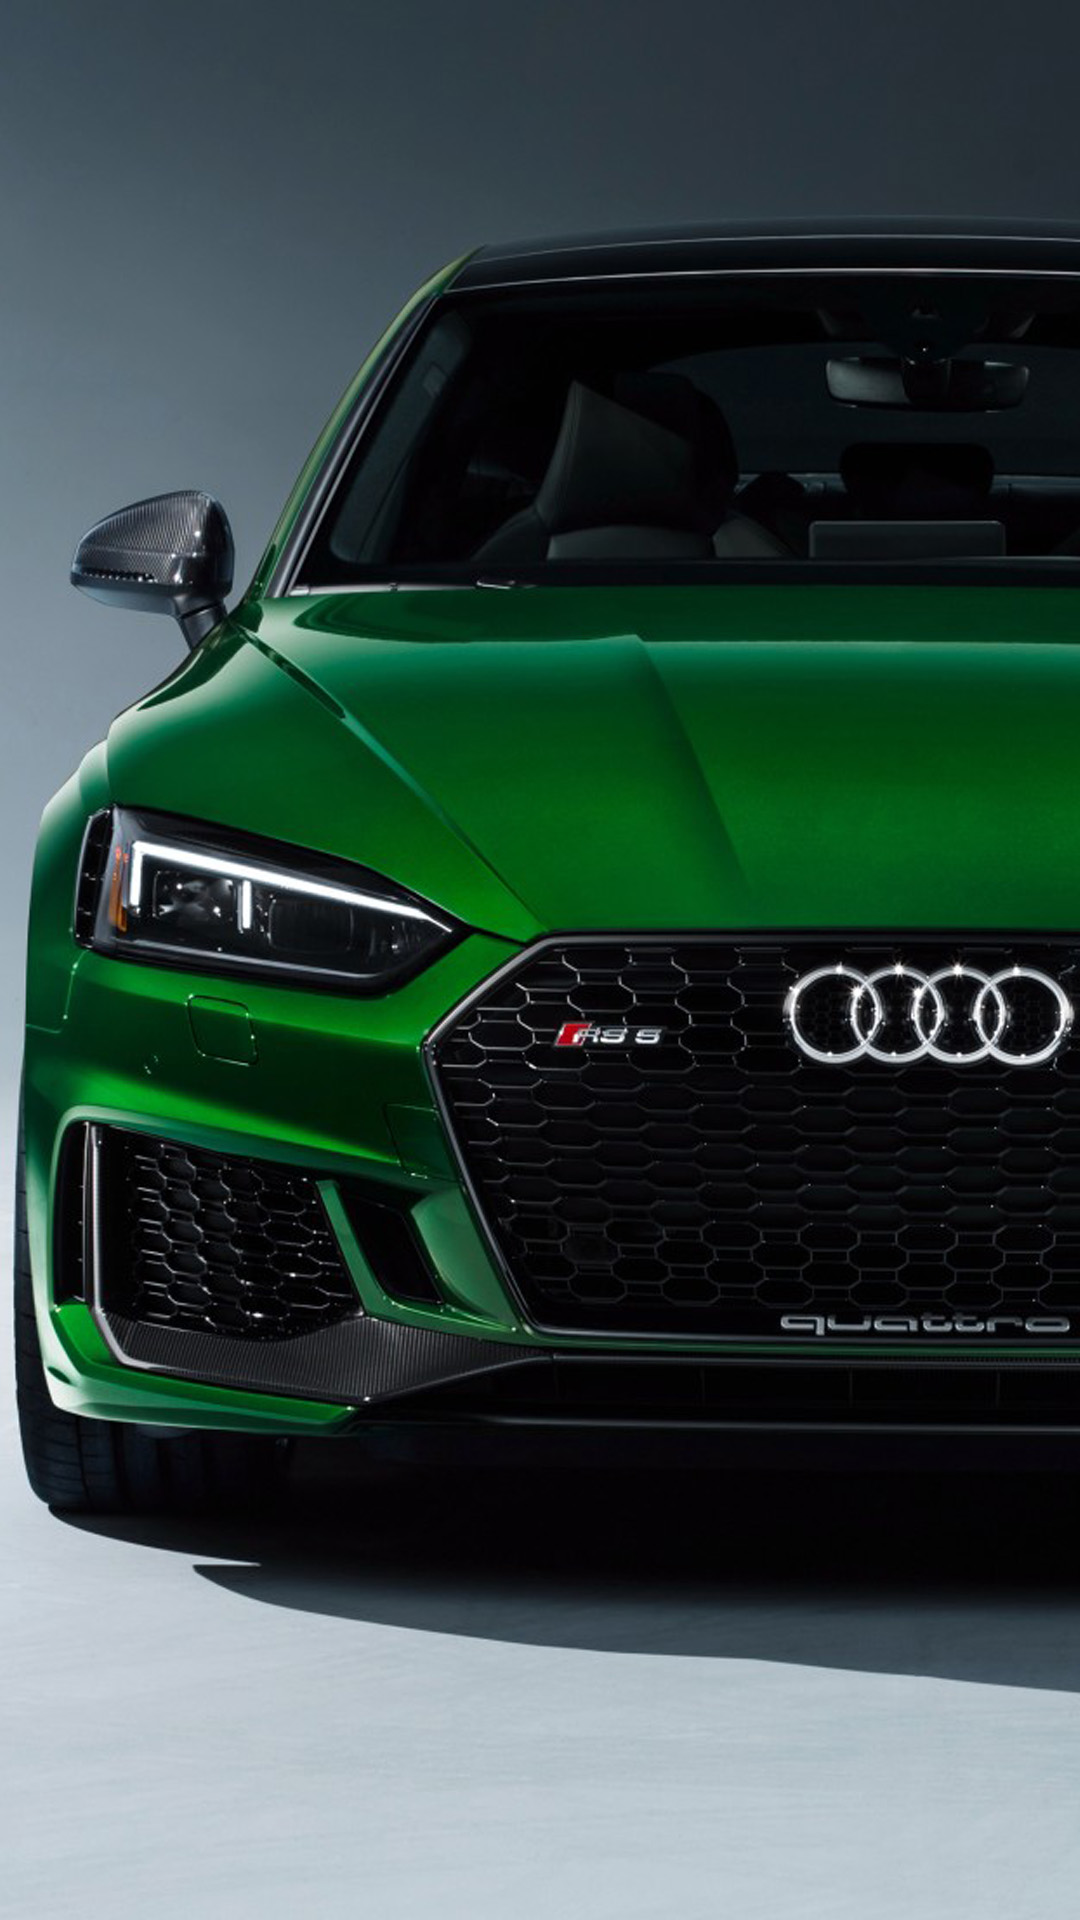 Greem Audi Rs 5 Sportback Hd Mobile Wallpaper Audi Rs 2019 356453 Hd Wallpaper Backgrounds Download